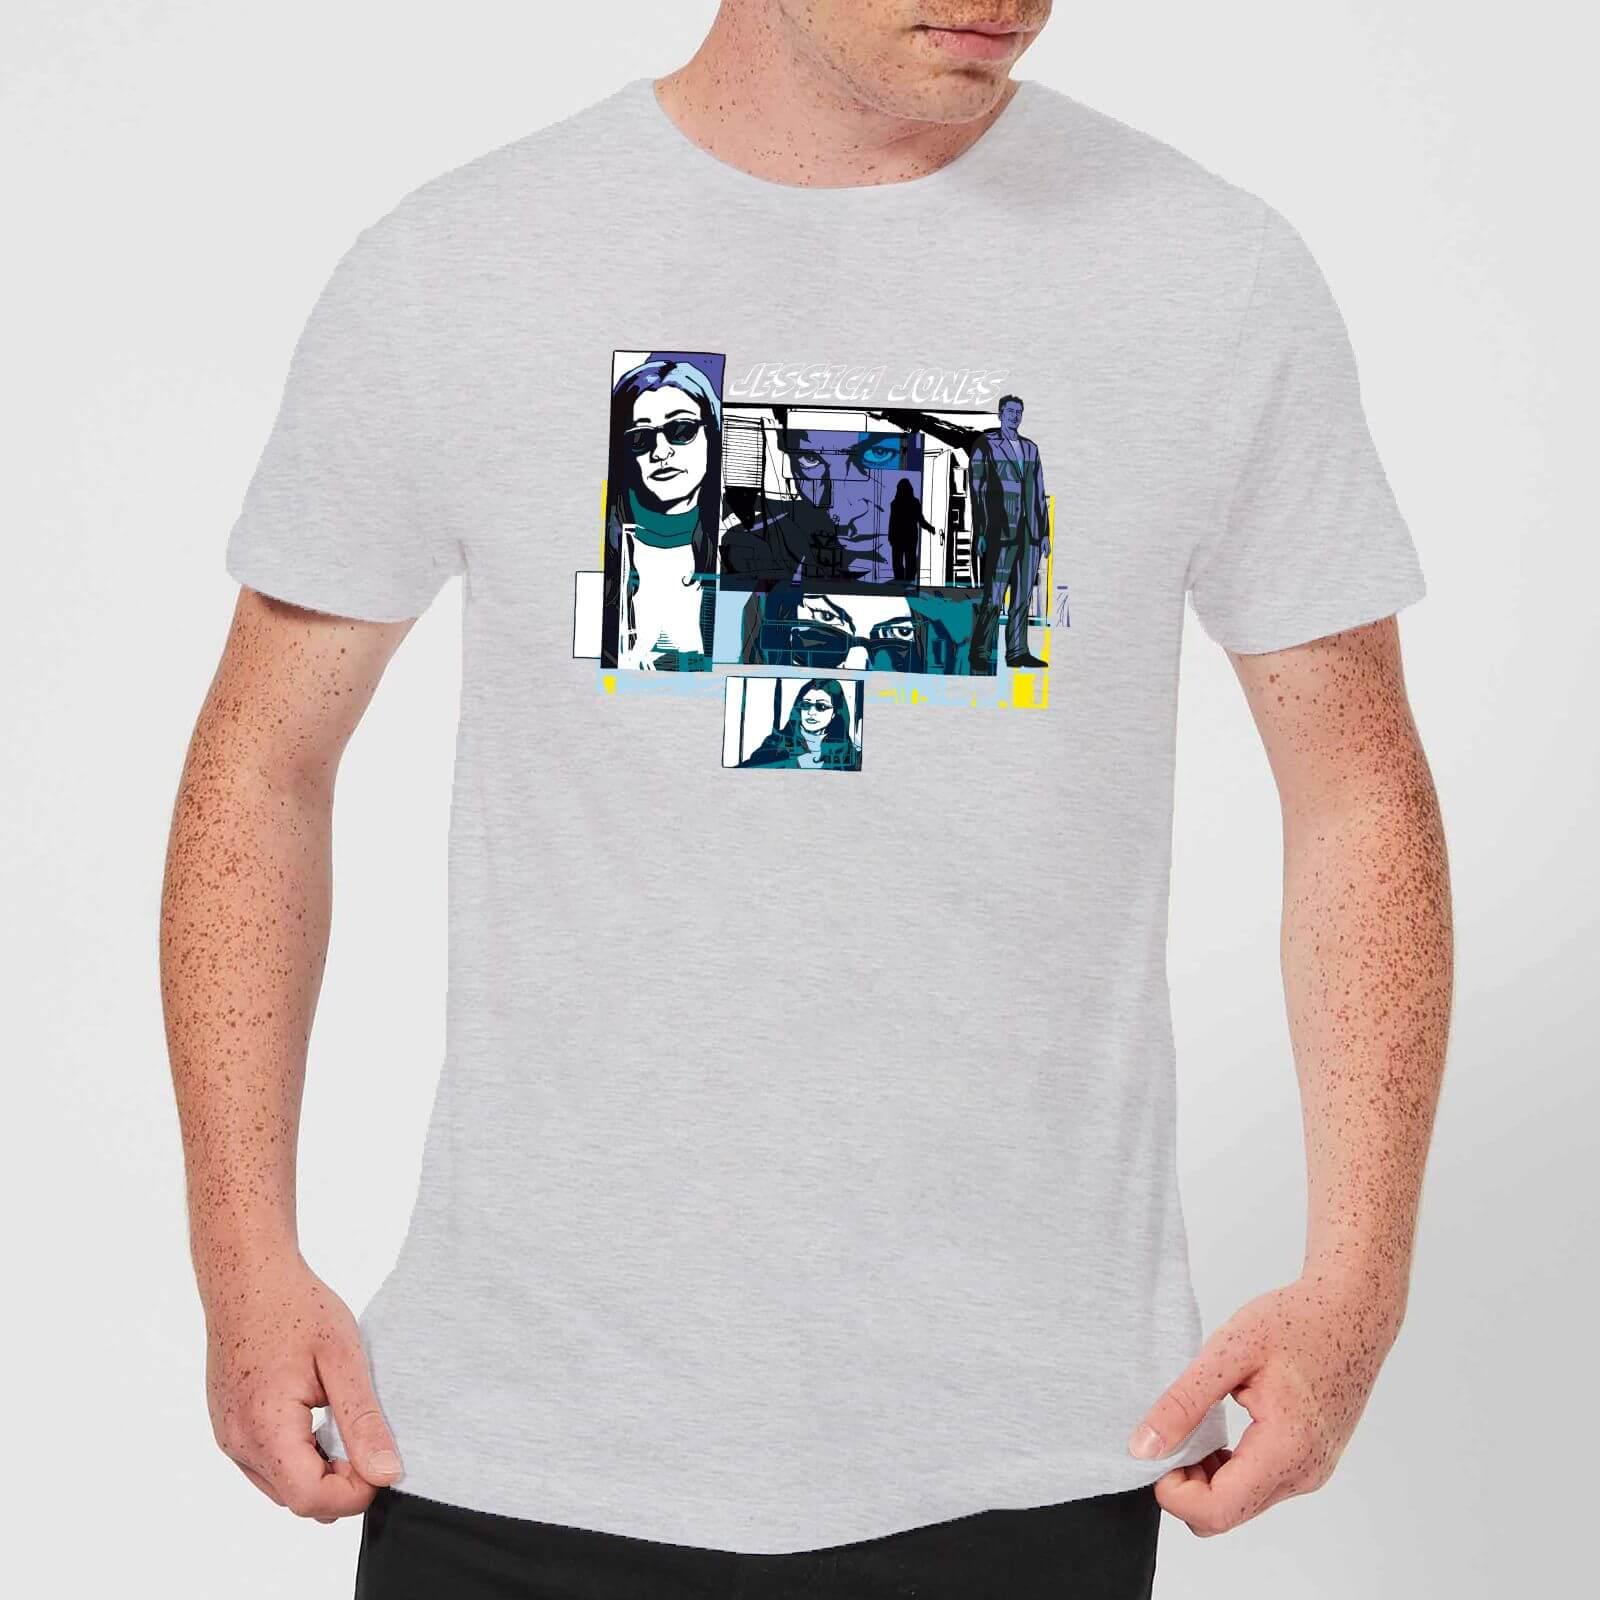 OfferteWeb.click 62-t-shirt-marvel-knights-jessica-jones-comic-panels-grigio